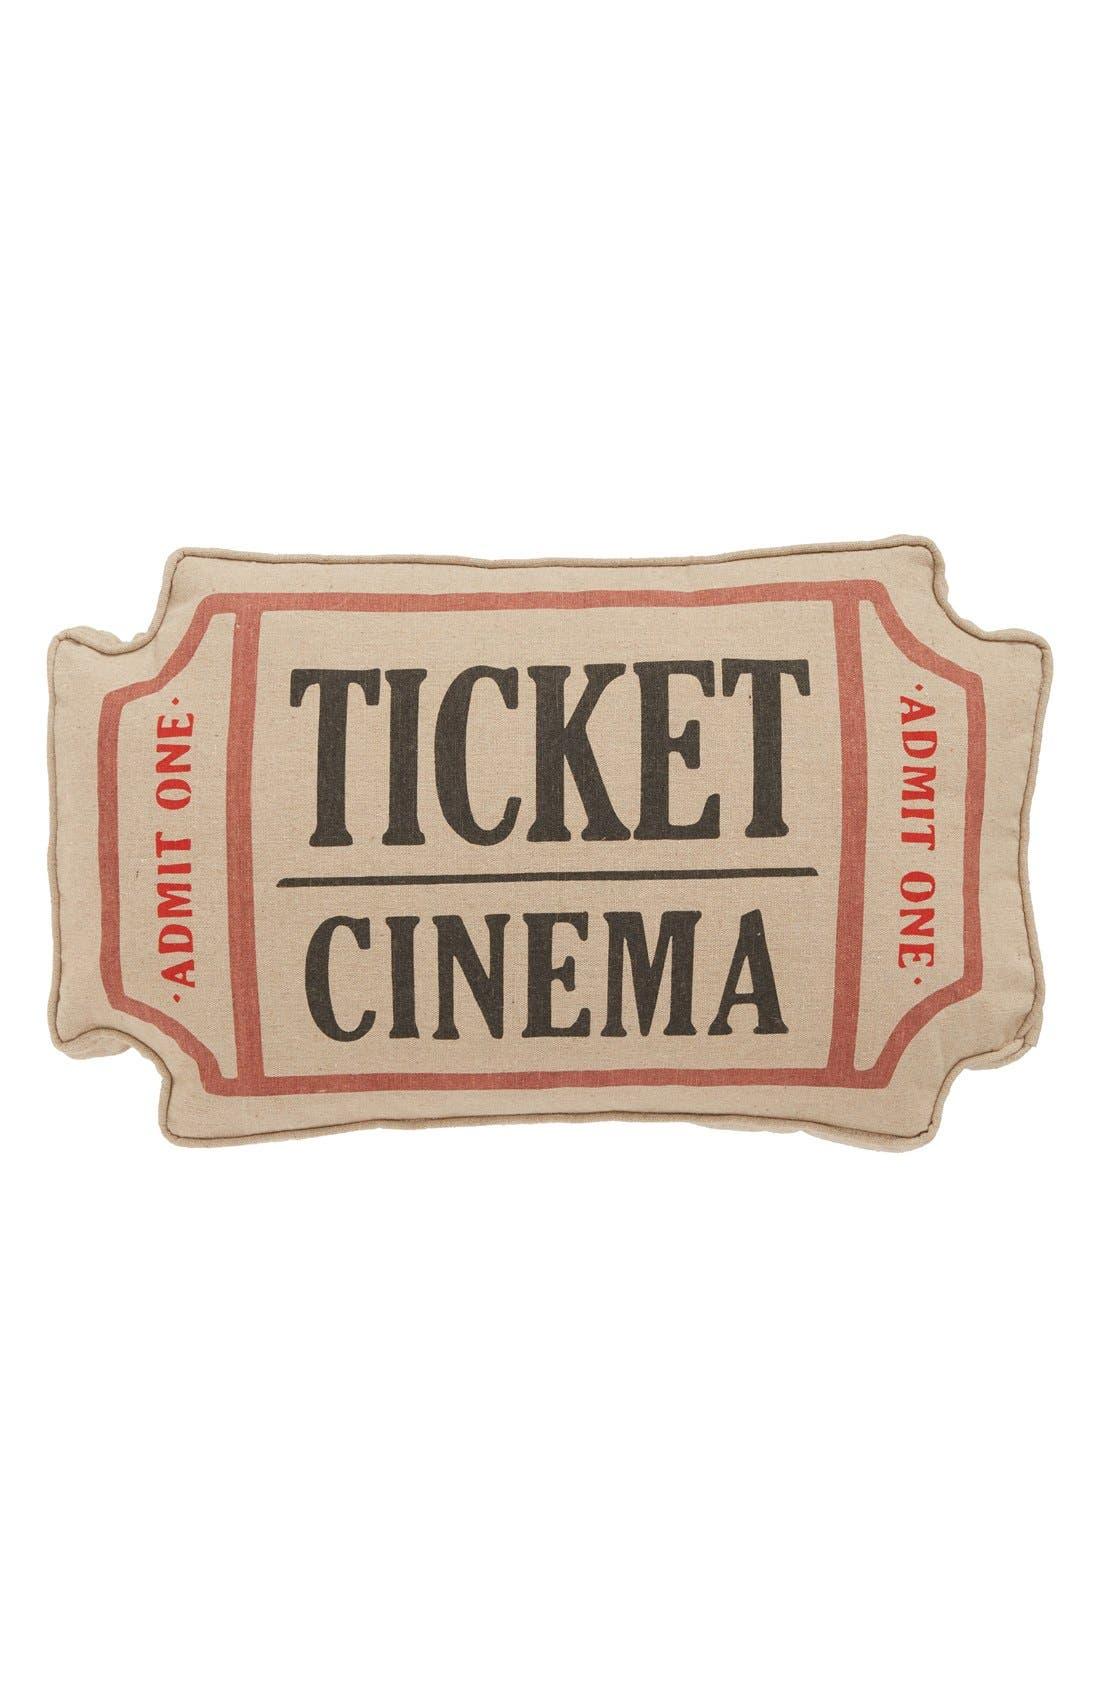 Main Image - Levtex 'Cinema Ticket' Accent Pillow